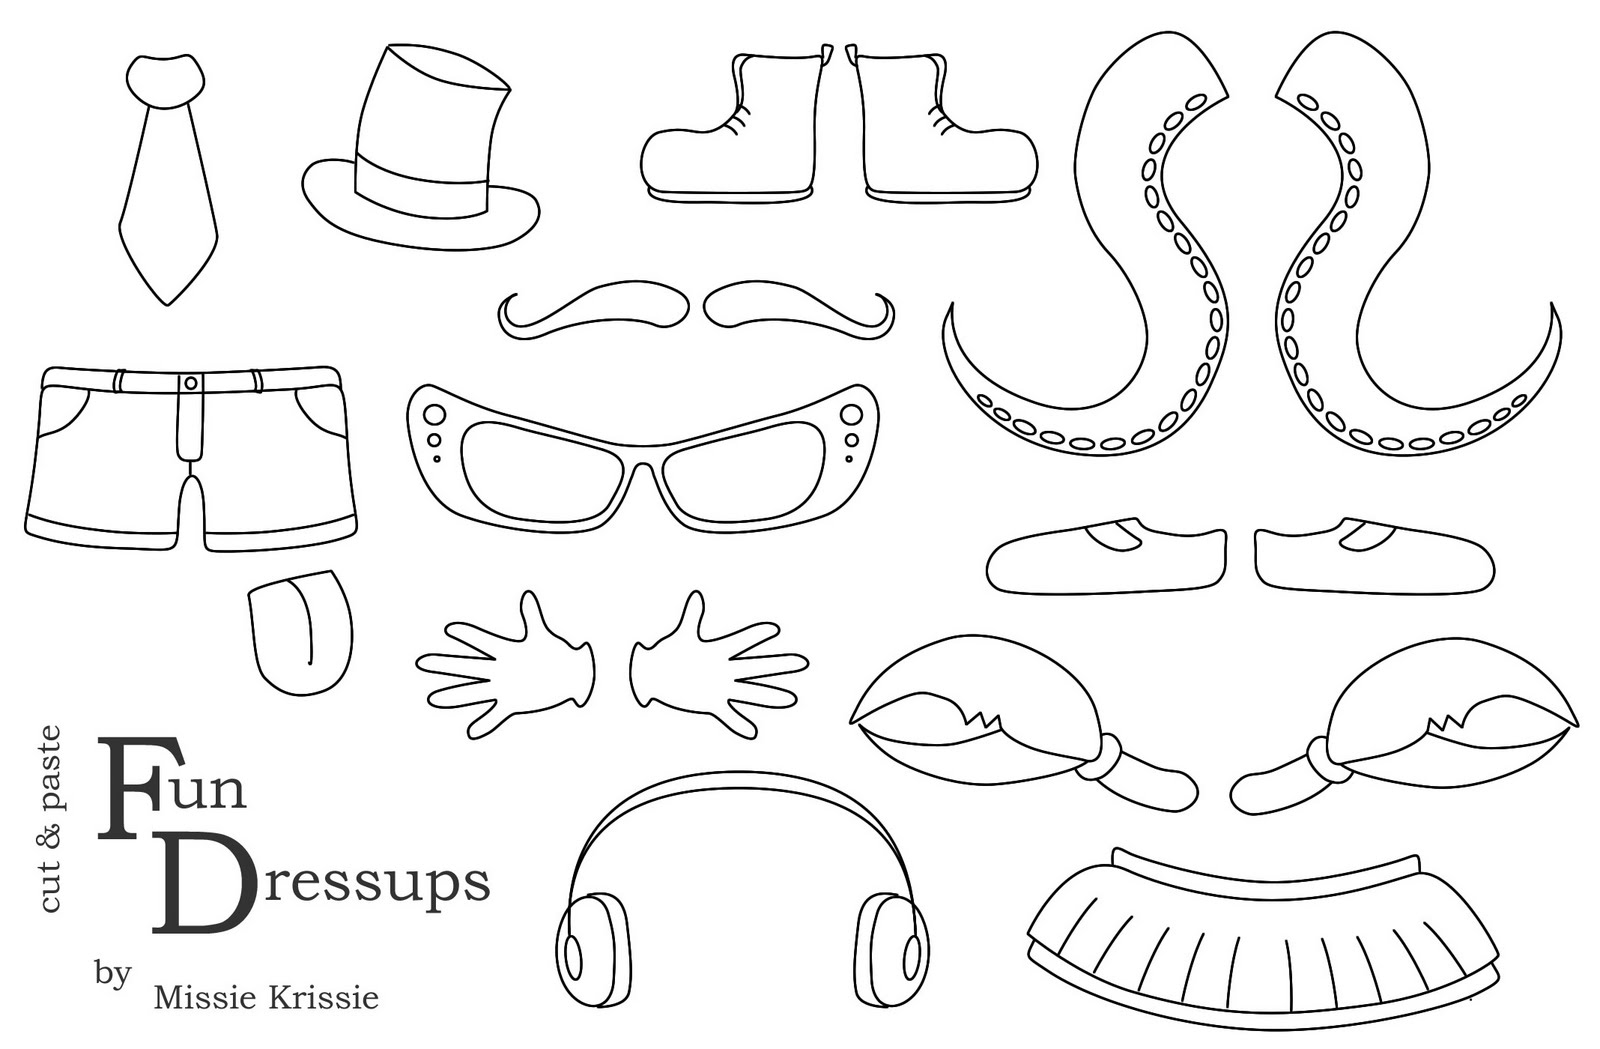 Missie Krissie Tuesday Freebies Cut And Paste Dressups